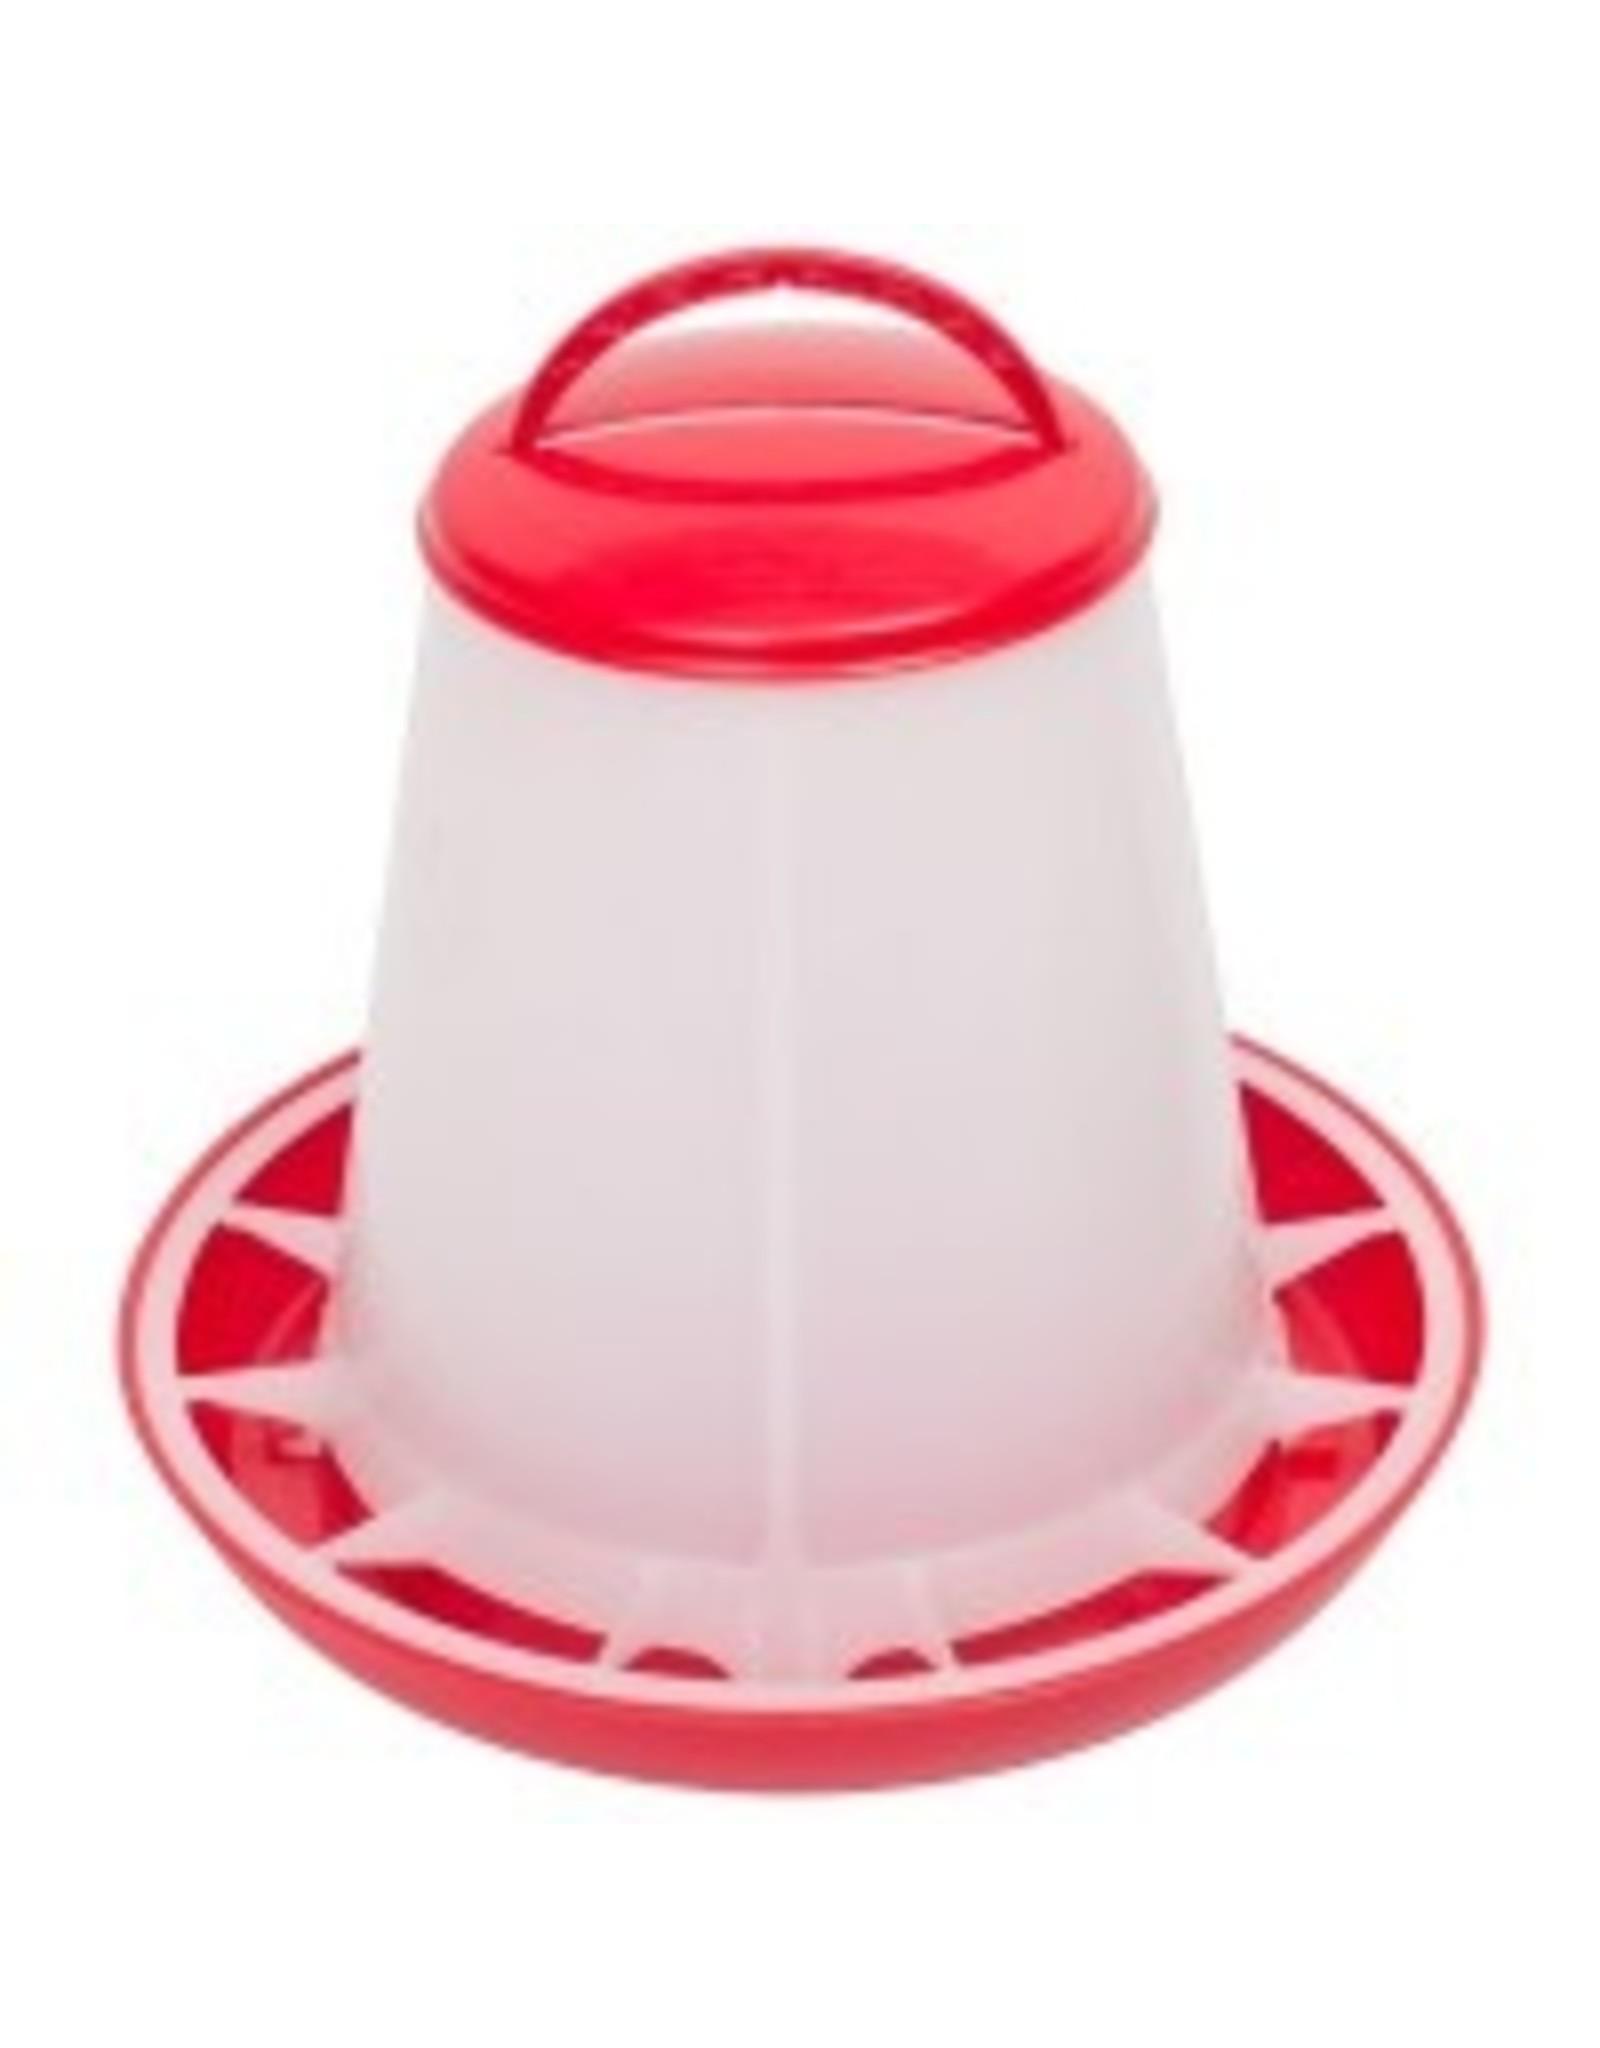 Drink/ Voerbakken voerbak plastic 10kg - 1 Stuks